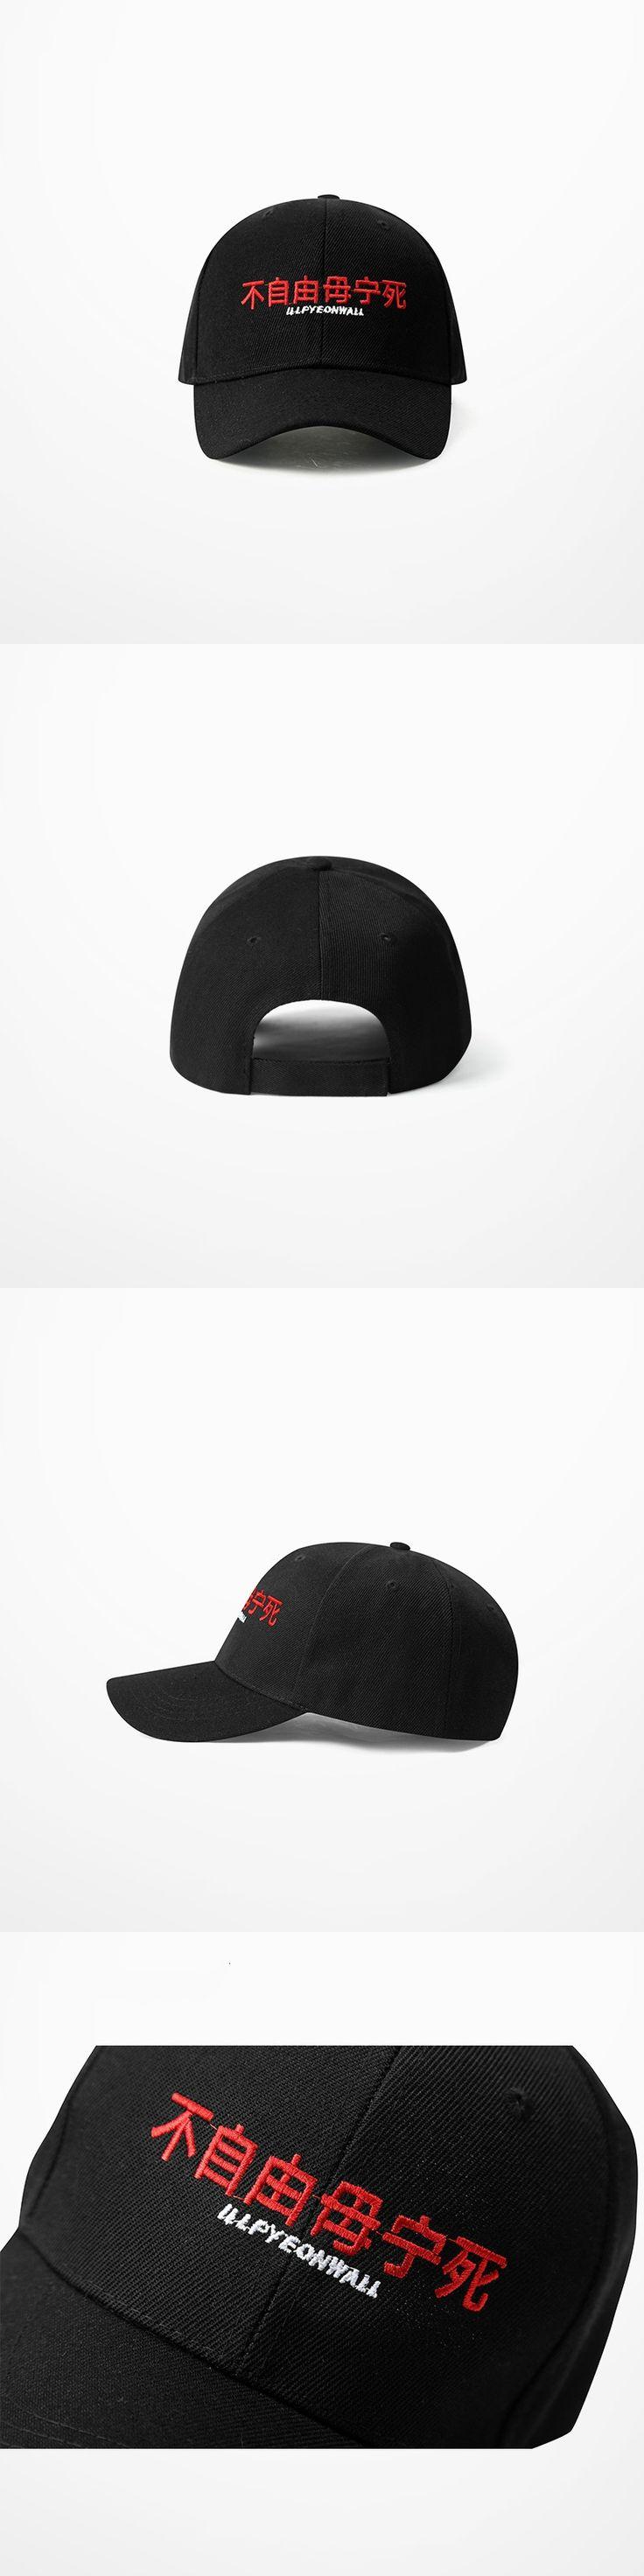 Give Me Liberty, Or Give Me Death! Chinese Letter Print Baseball Cap Men Fashion Design Hip Hop Cap Male Skateboard Hats For Men